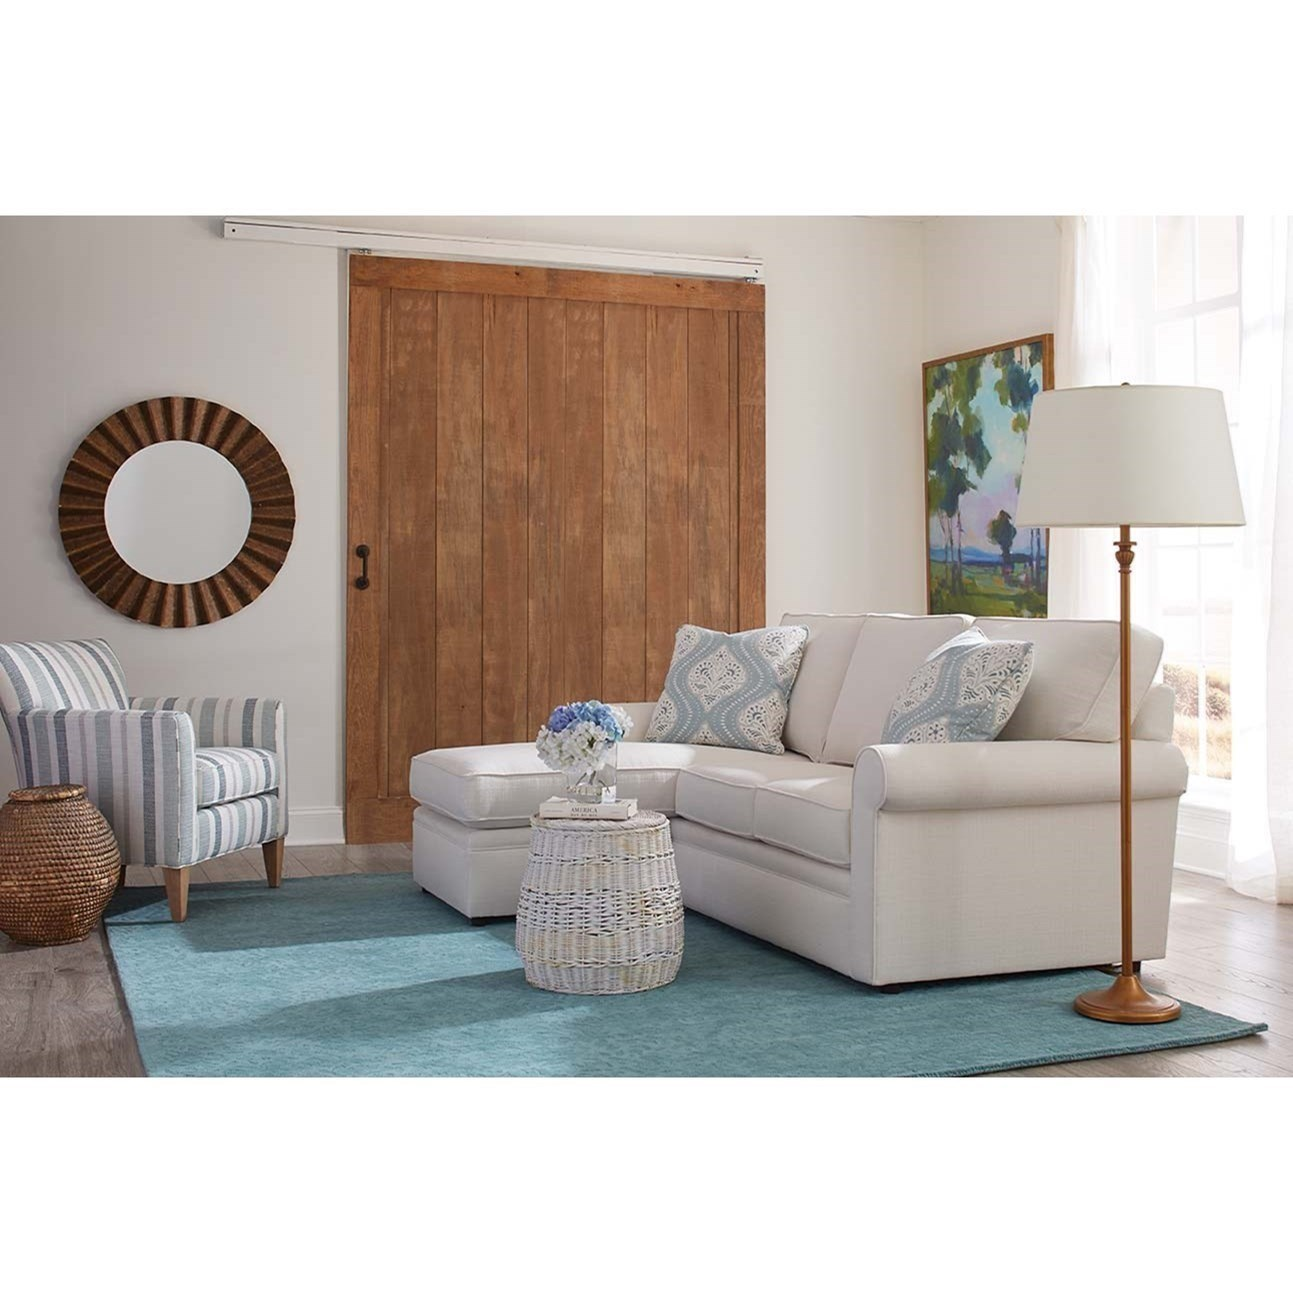 Pleasant Rowe Dalton Sofa With Reversible Storage Chaise Ottoman Lamtechconsult Wood Chair Design Ideas Lamtechconsultcom